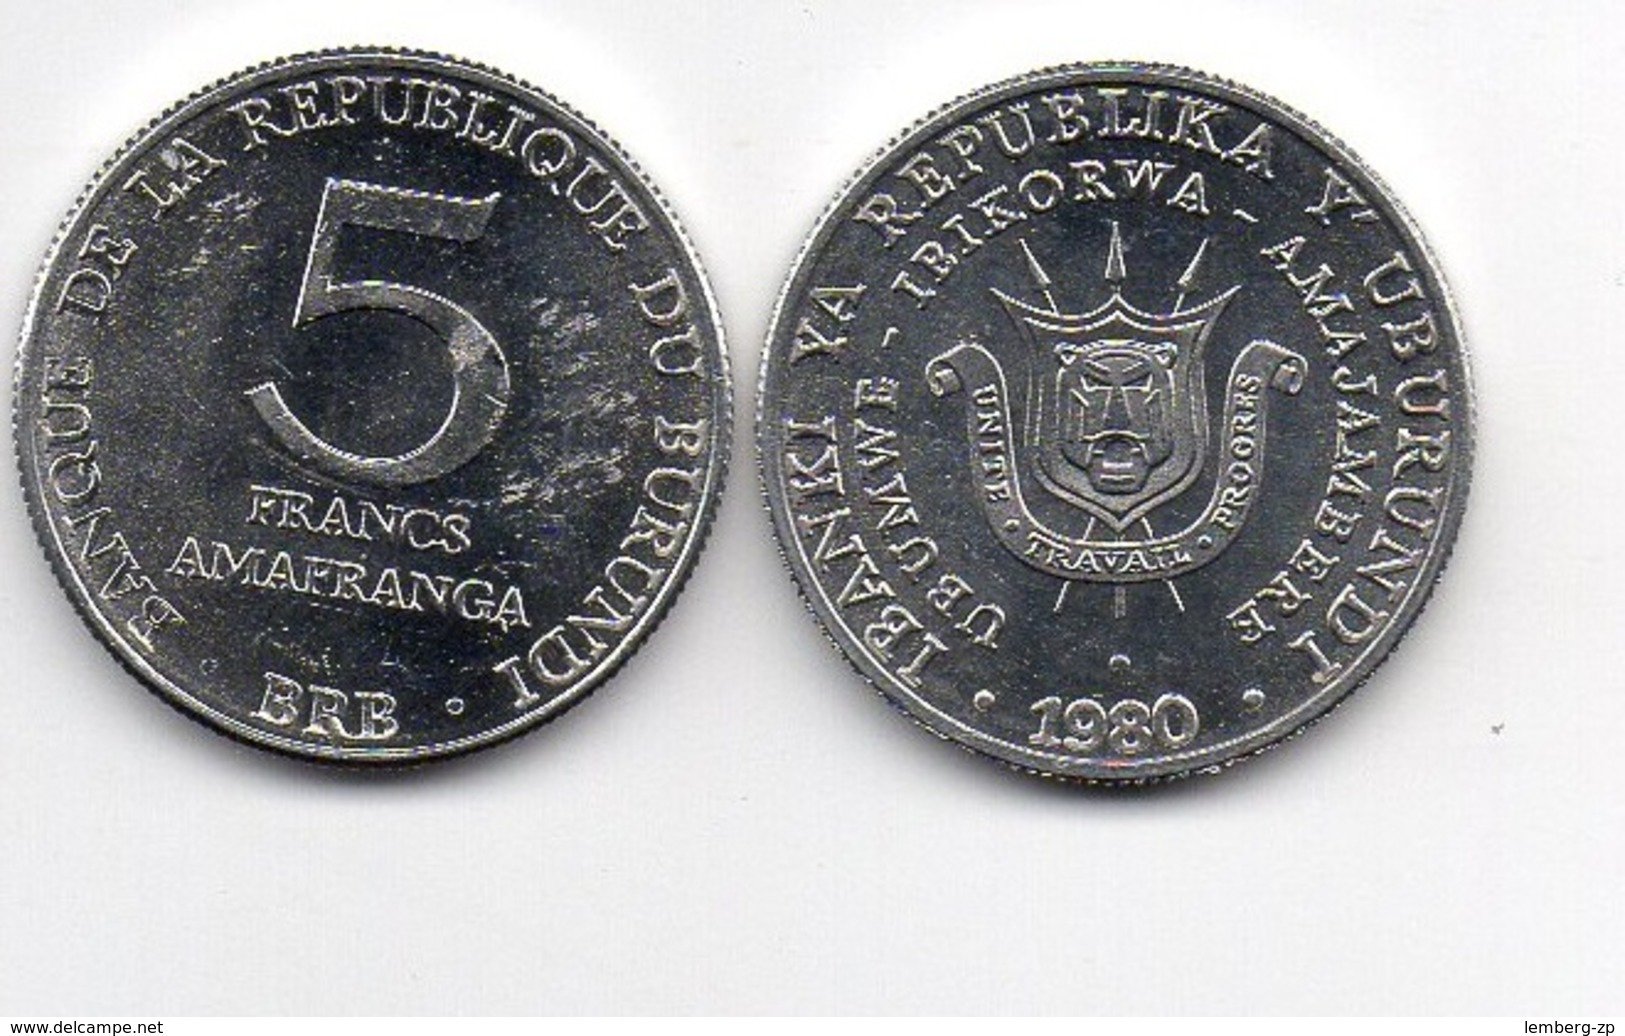 Burundi - 5 Francs 1980 VF++ Lemberg-Zp - Burundi